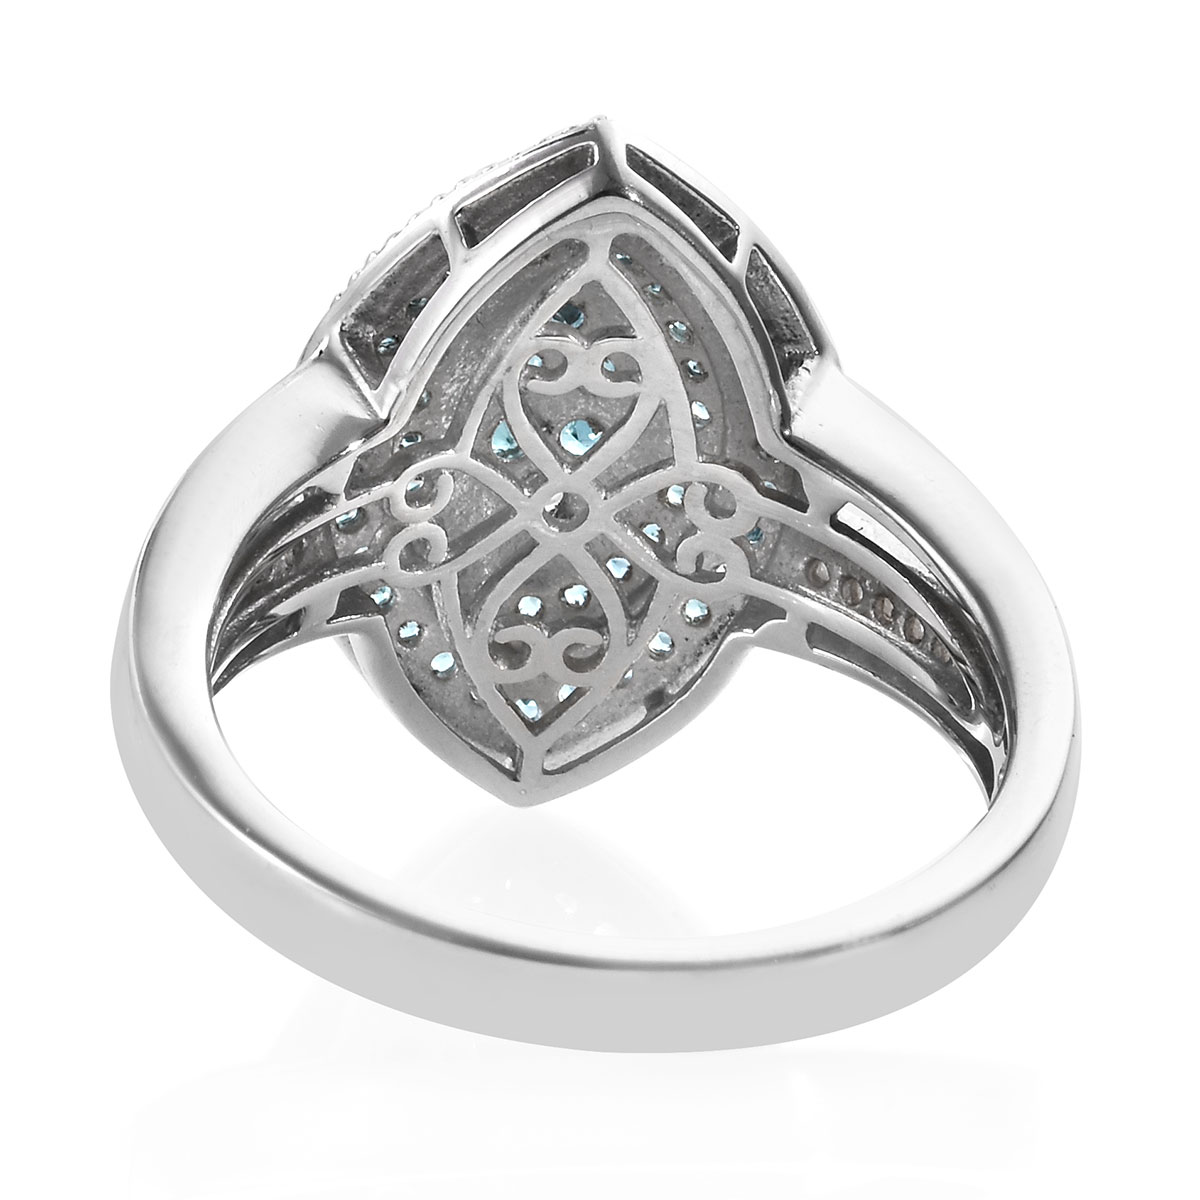 Monte Belo Indicolite, Zircon Ring in Platinum Over Sterling Silver (Size 8.0) 1.06 ctw